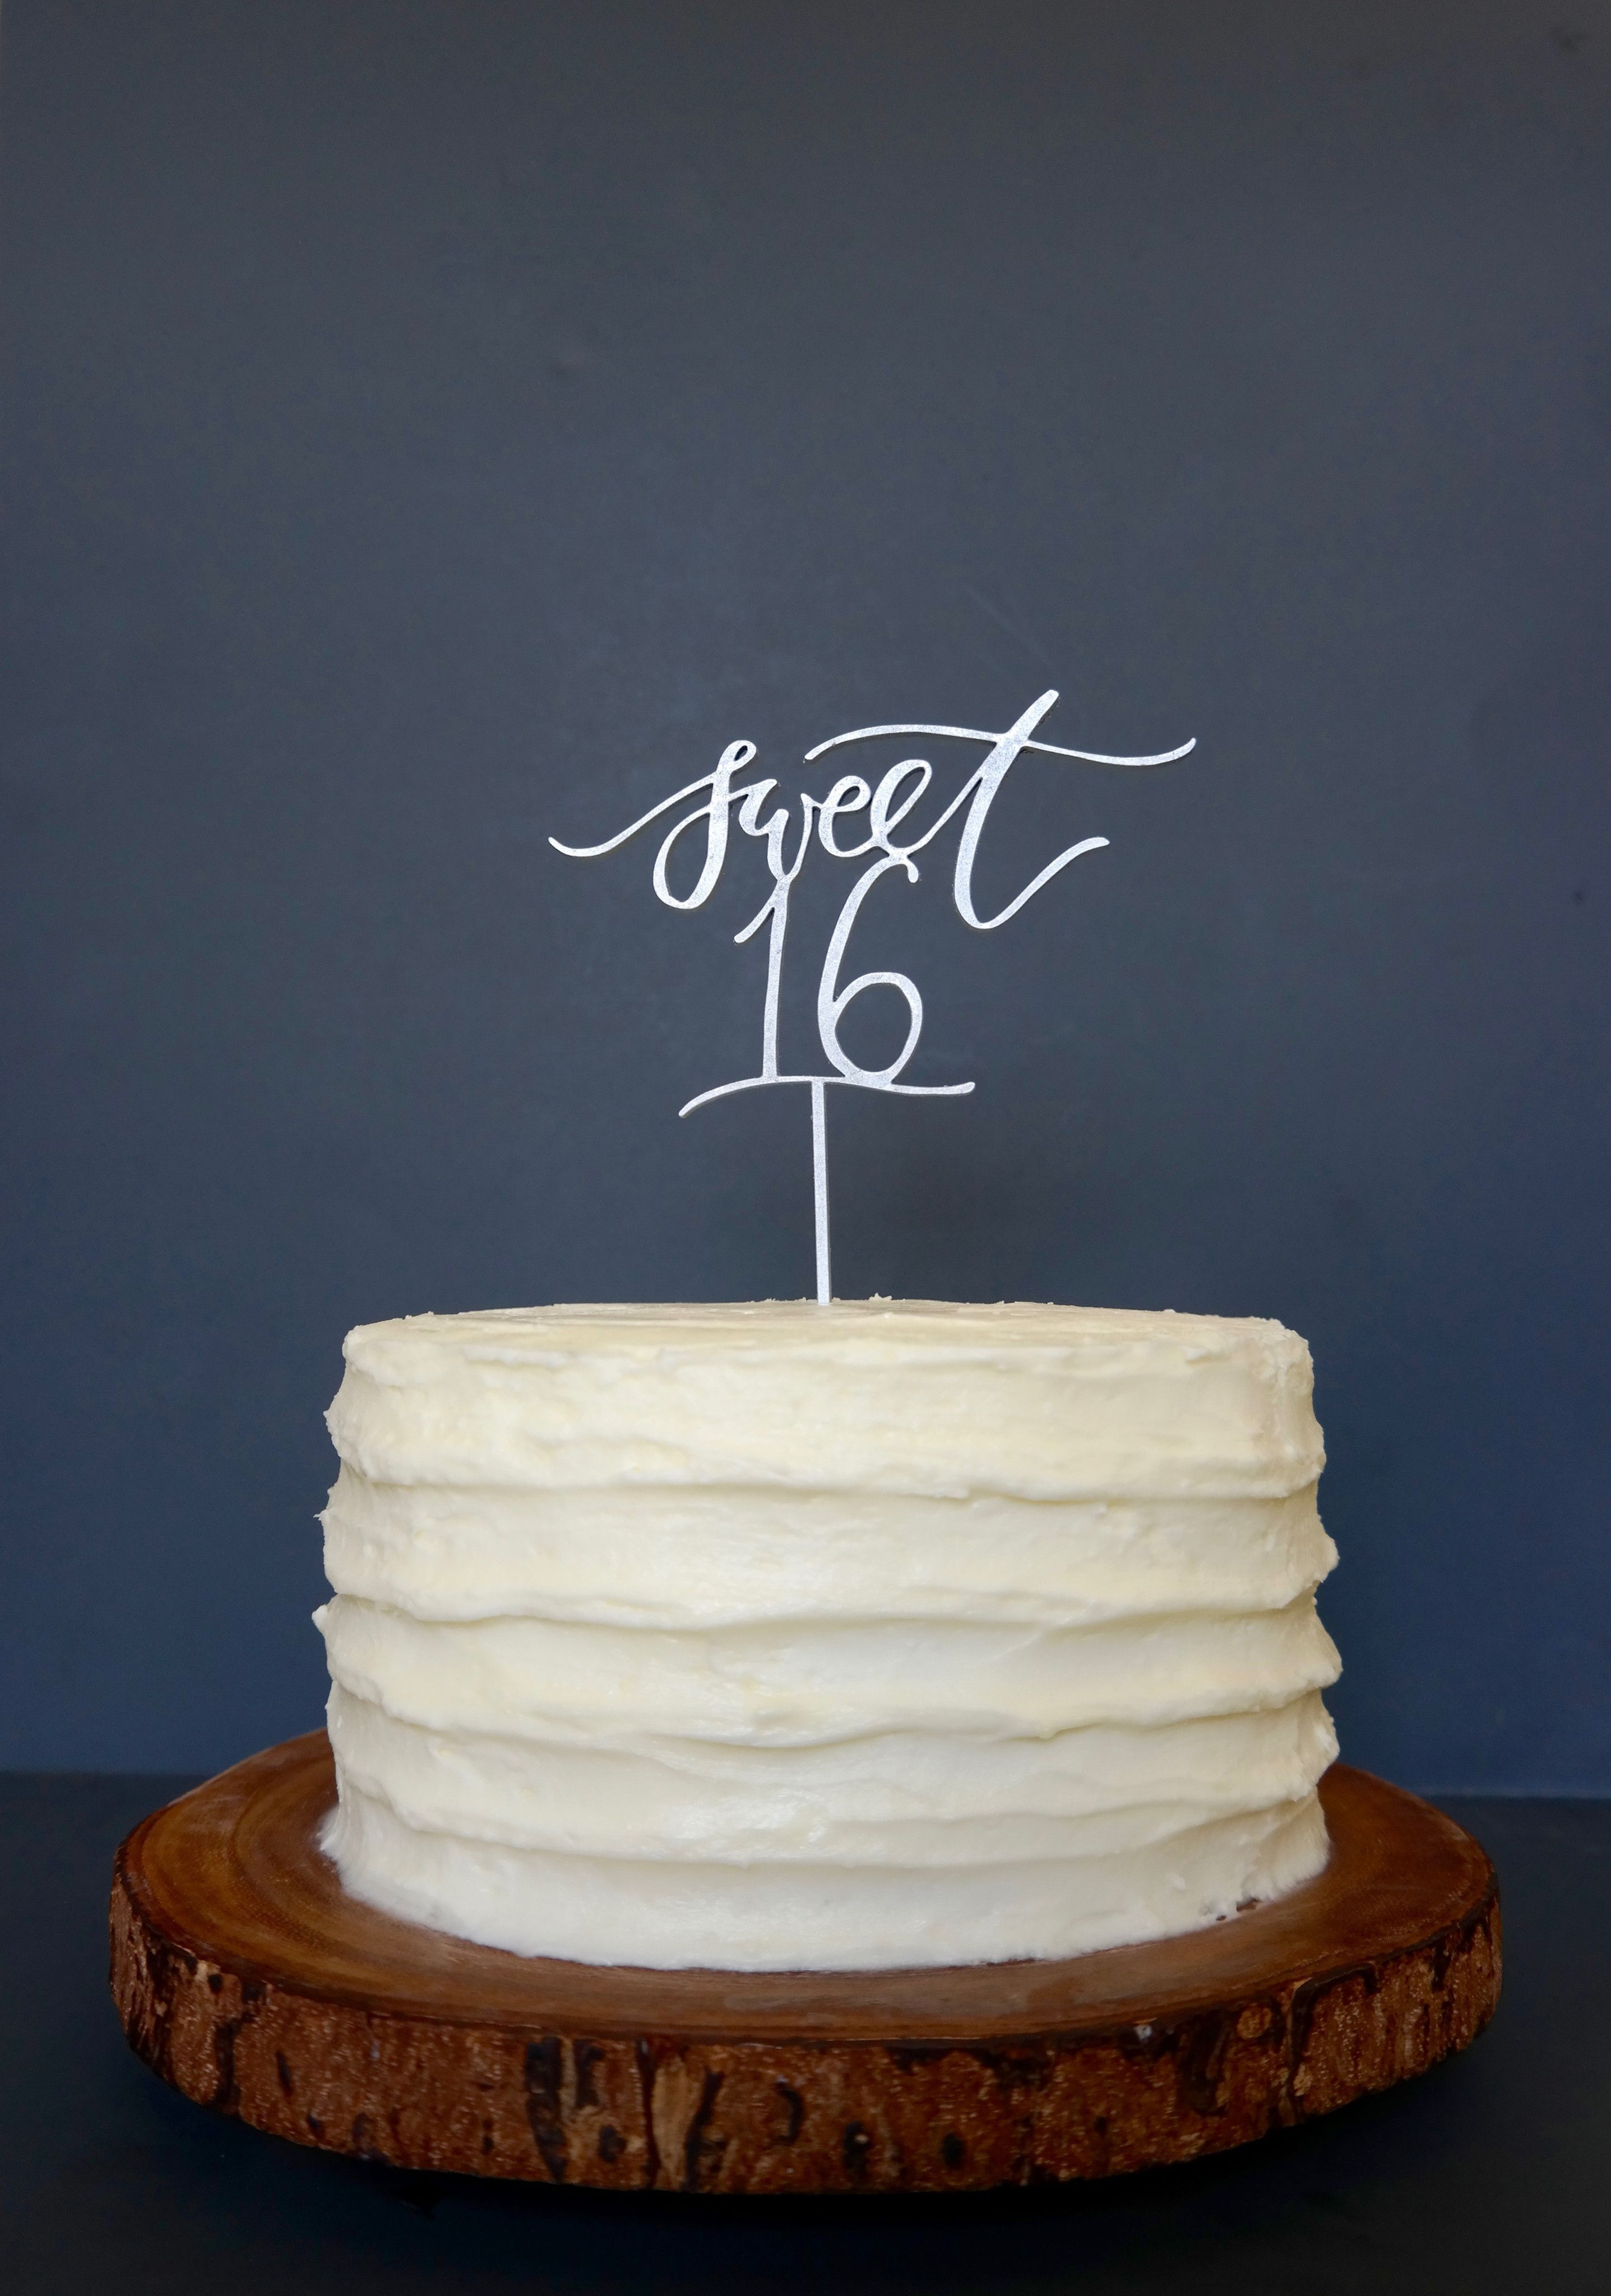 cab1c20b886c Sweet 16 Cake Topper in 2019